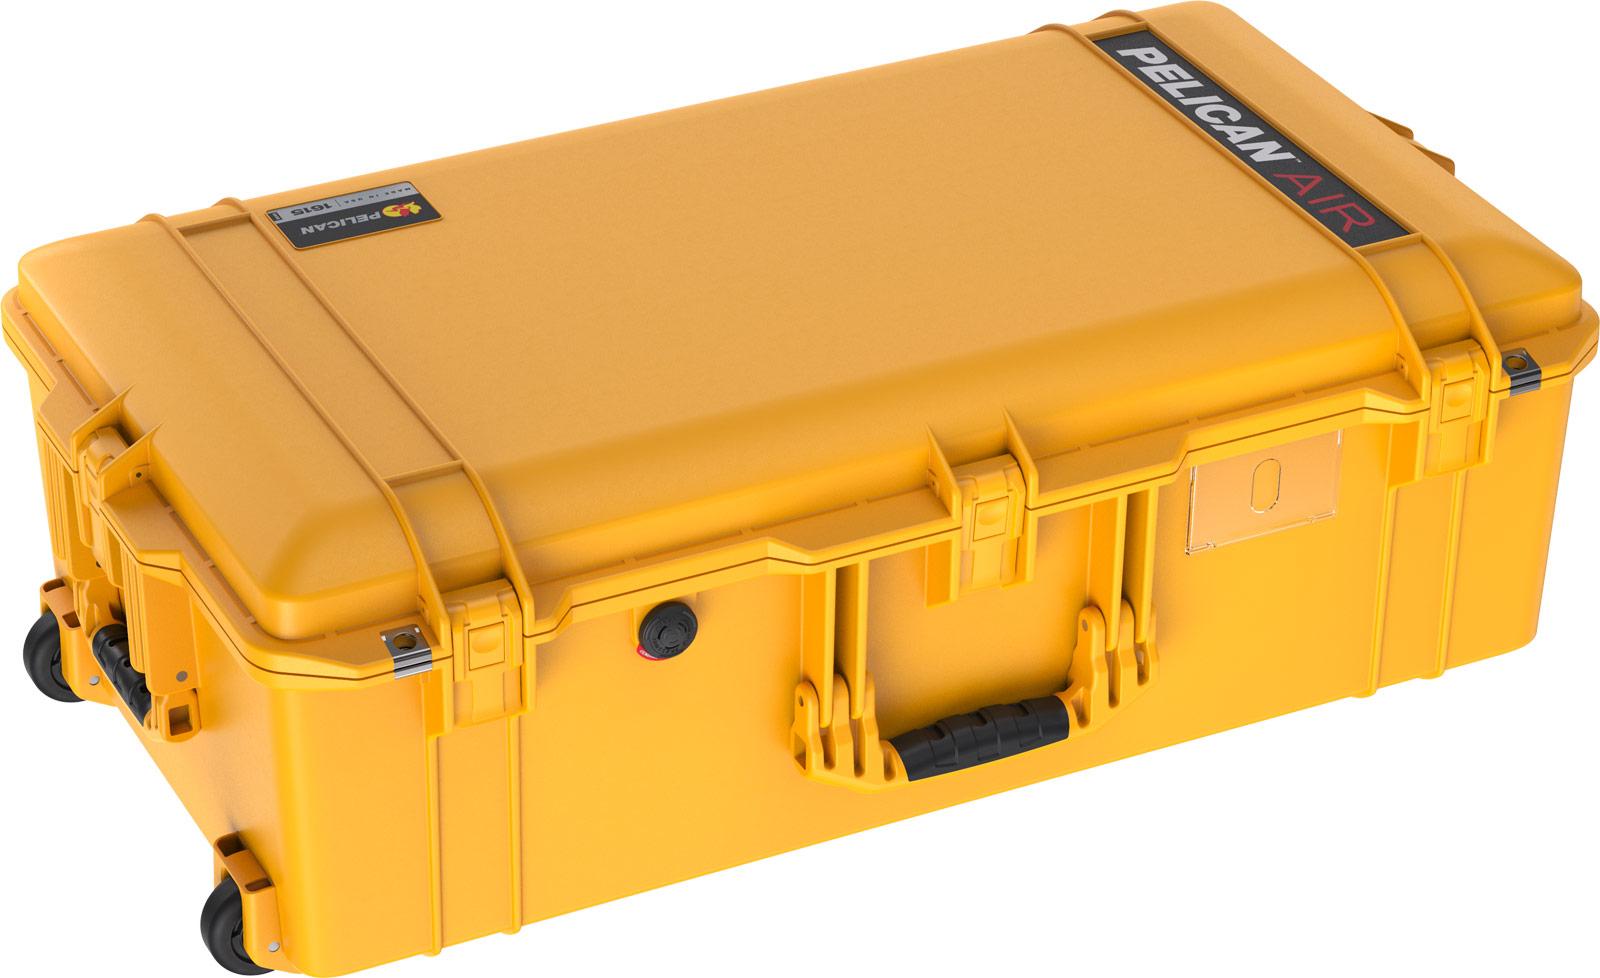 shop pelican air 1615 buy yellow travel case